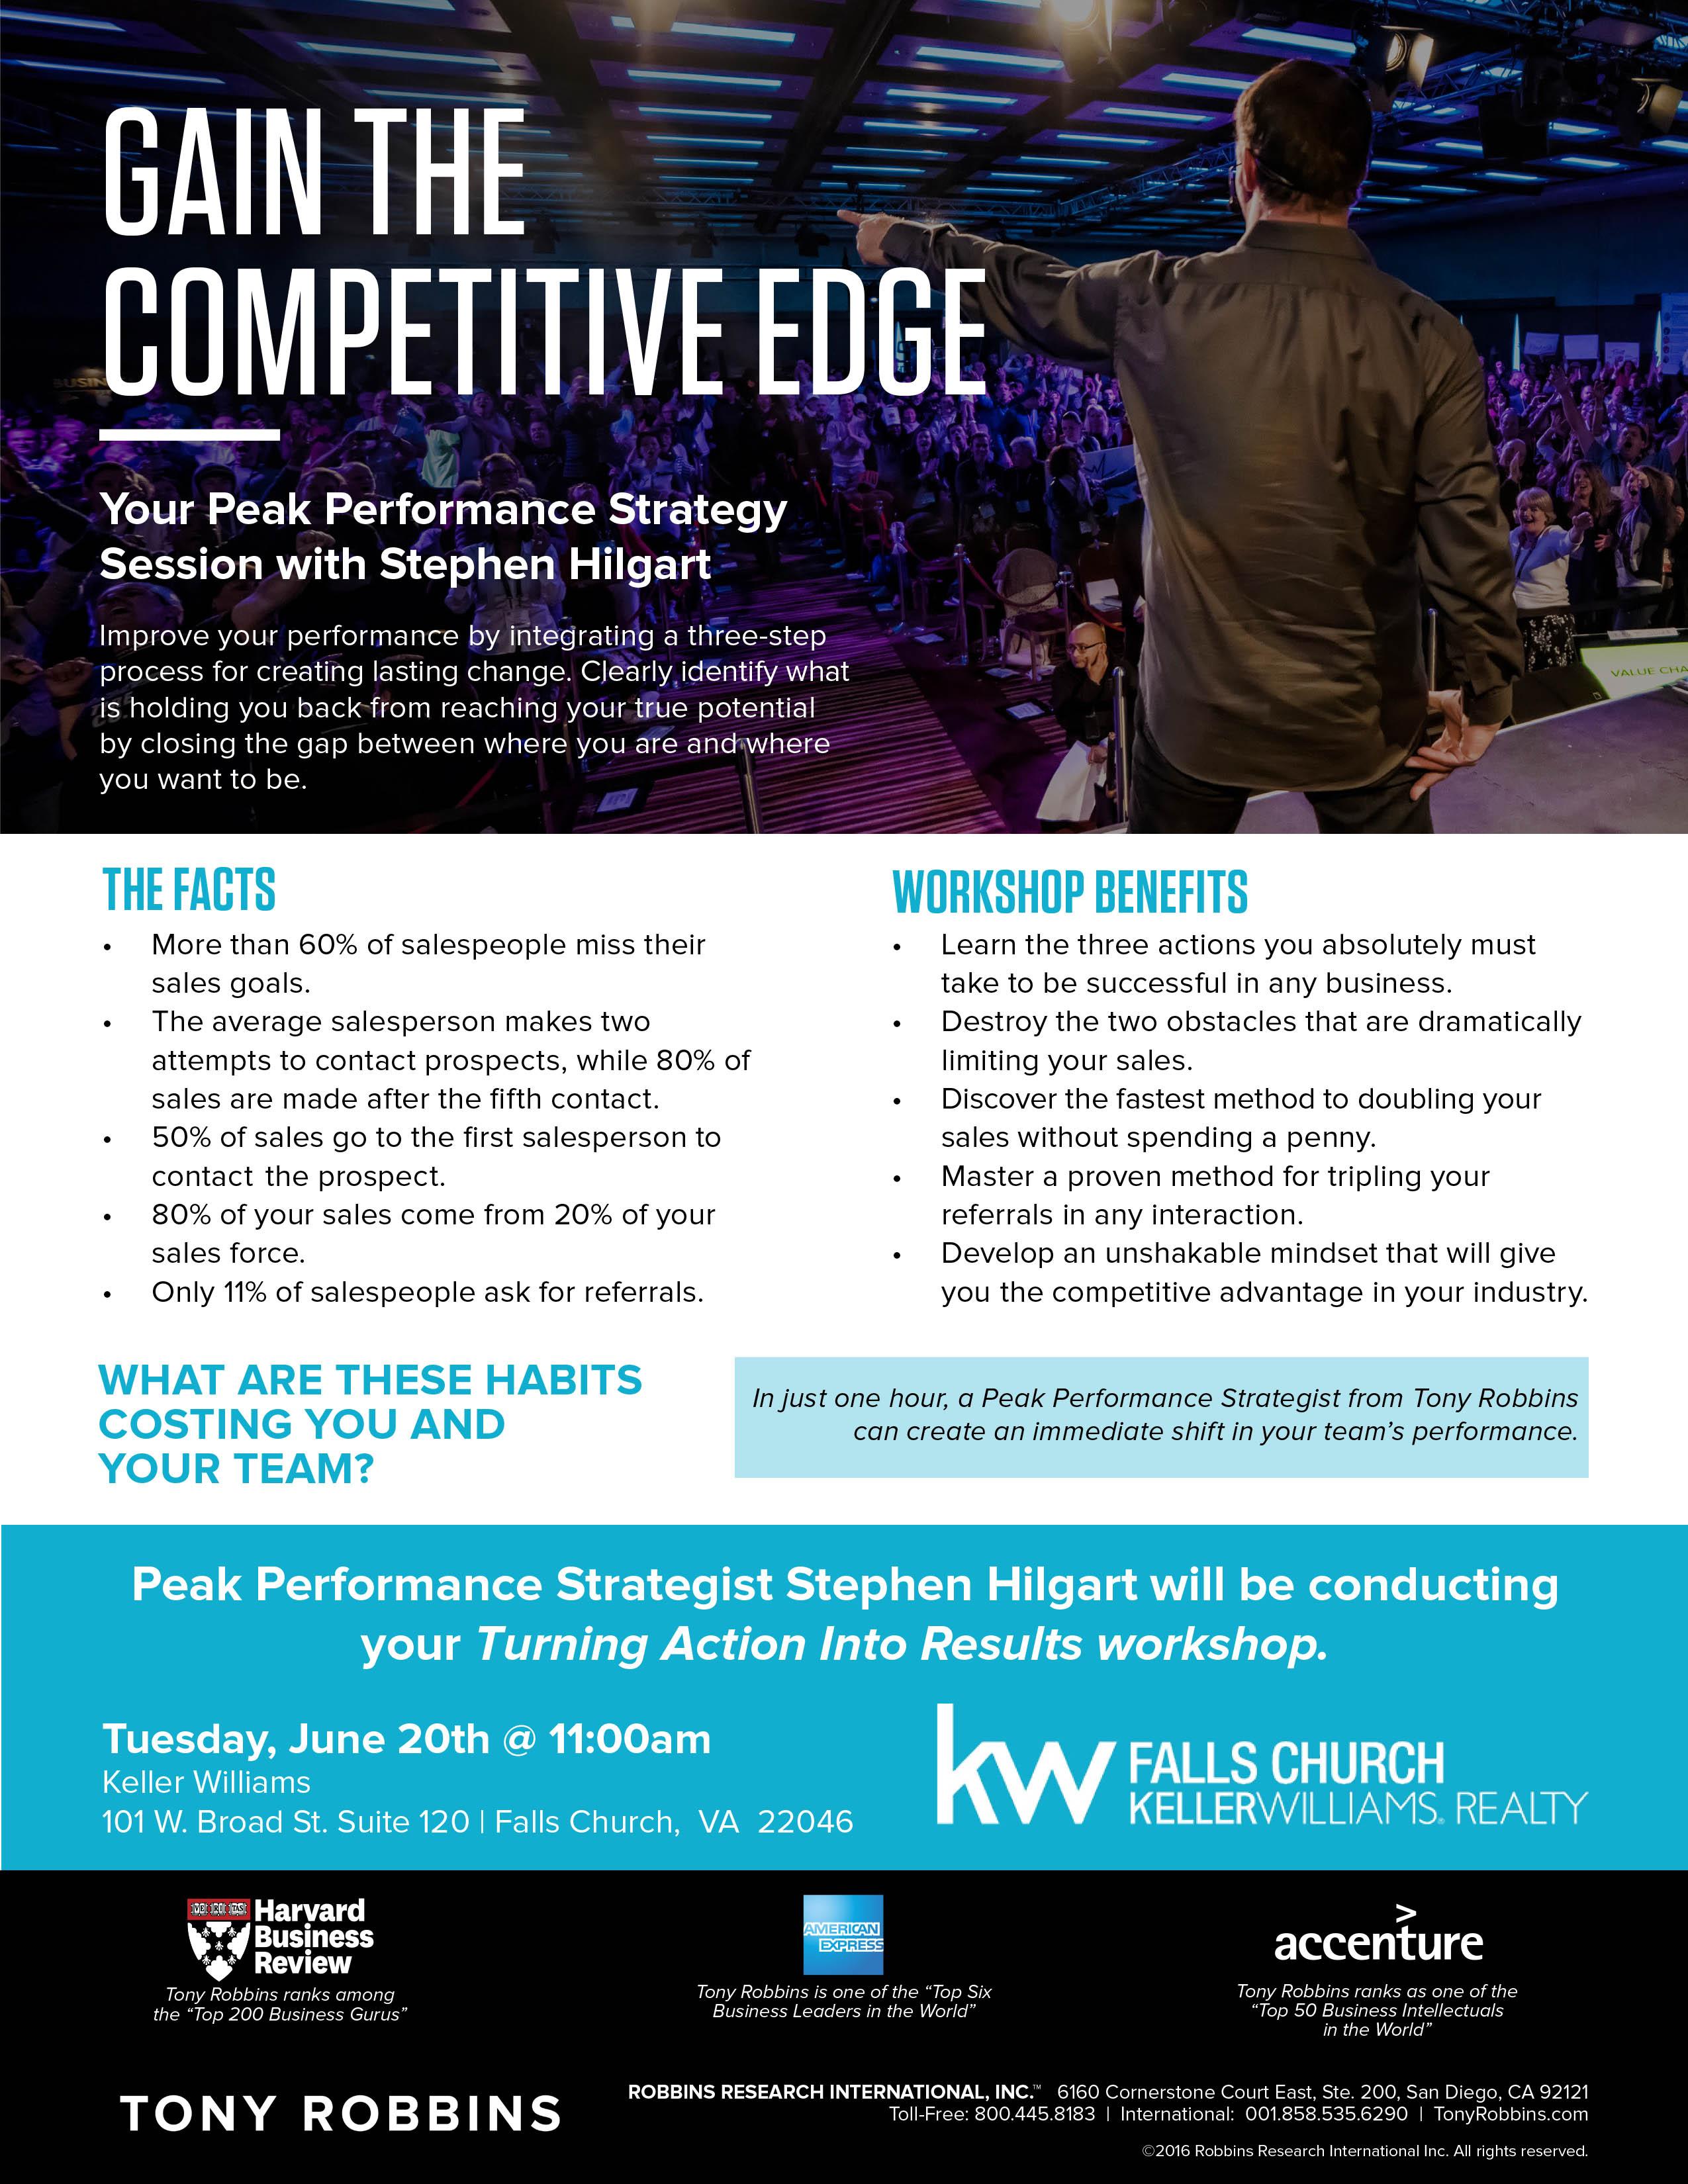 Peak Performance event